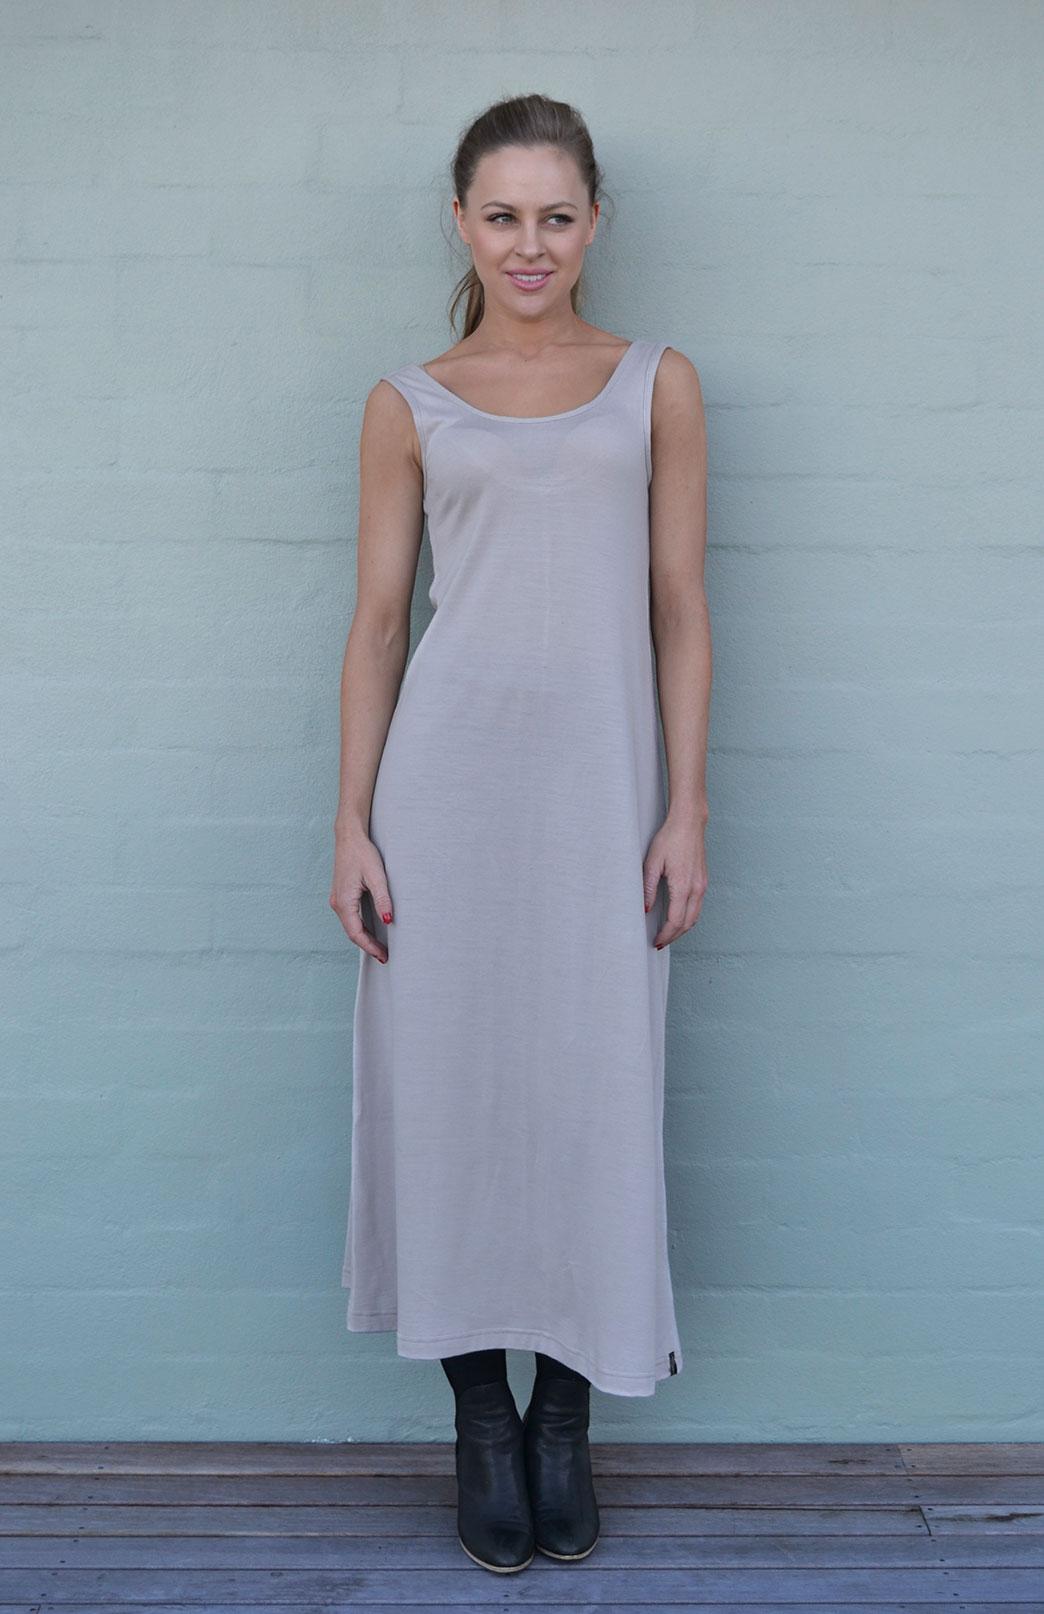 Maxi Dress - Plain - Women's Merino Wool Stone Maxi Dress with Scoop Neckline - Smitten Merino Tasmania Australia